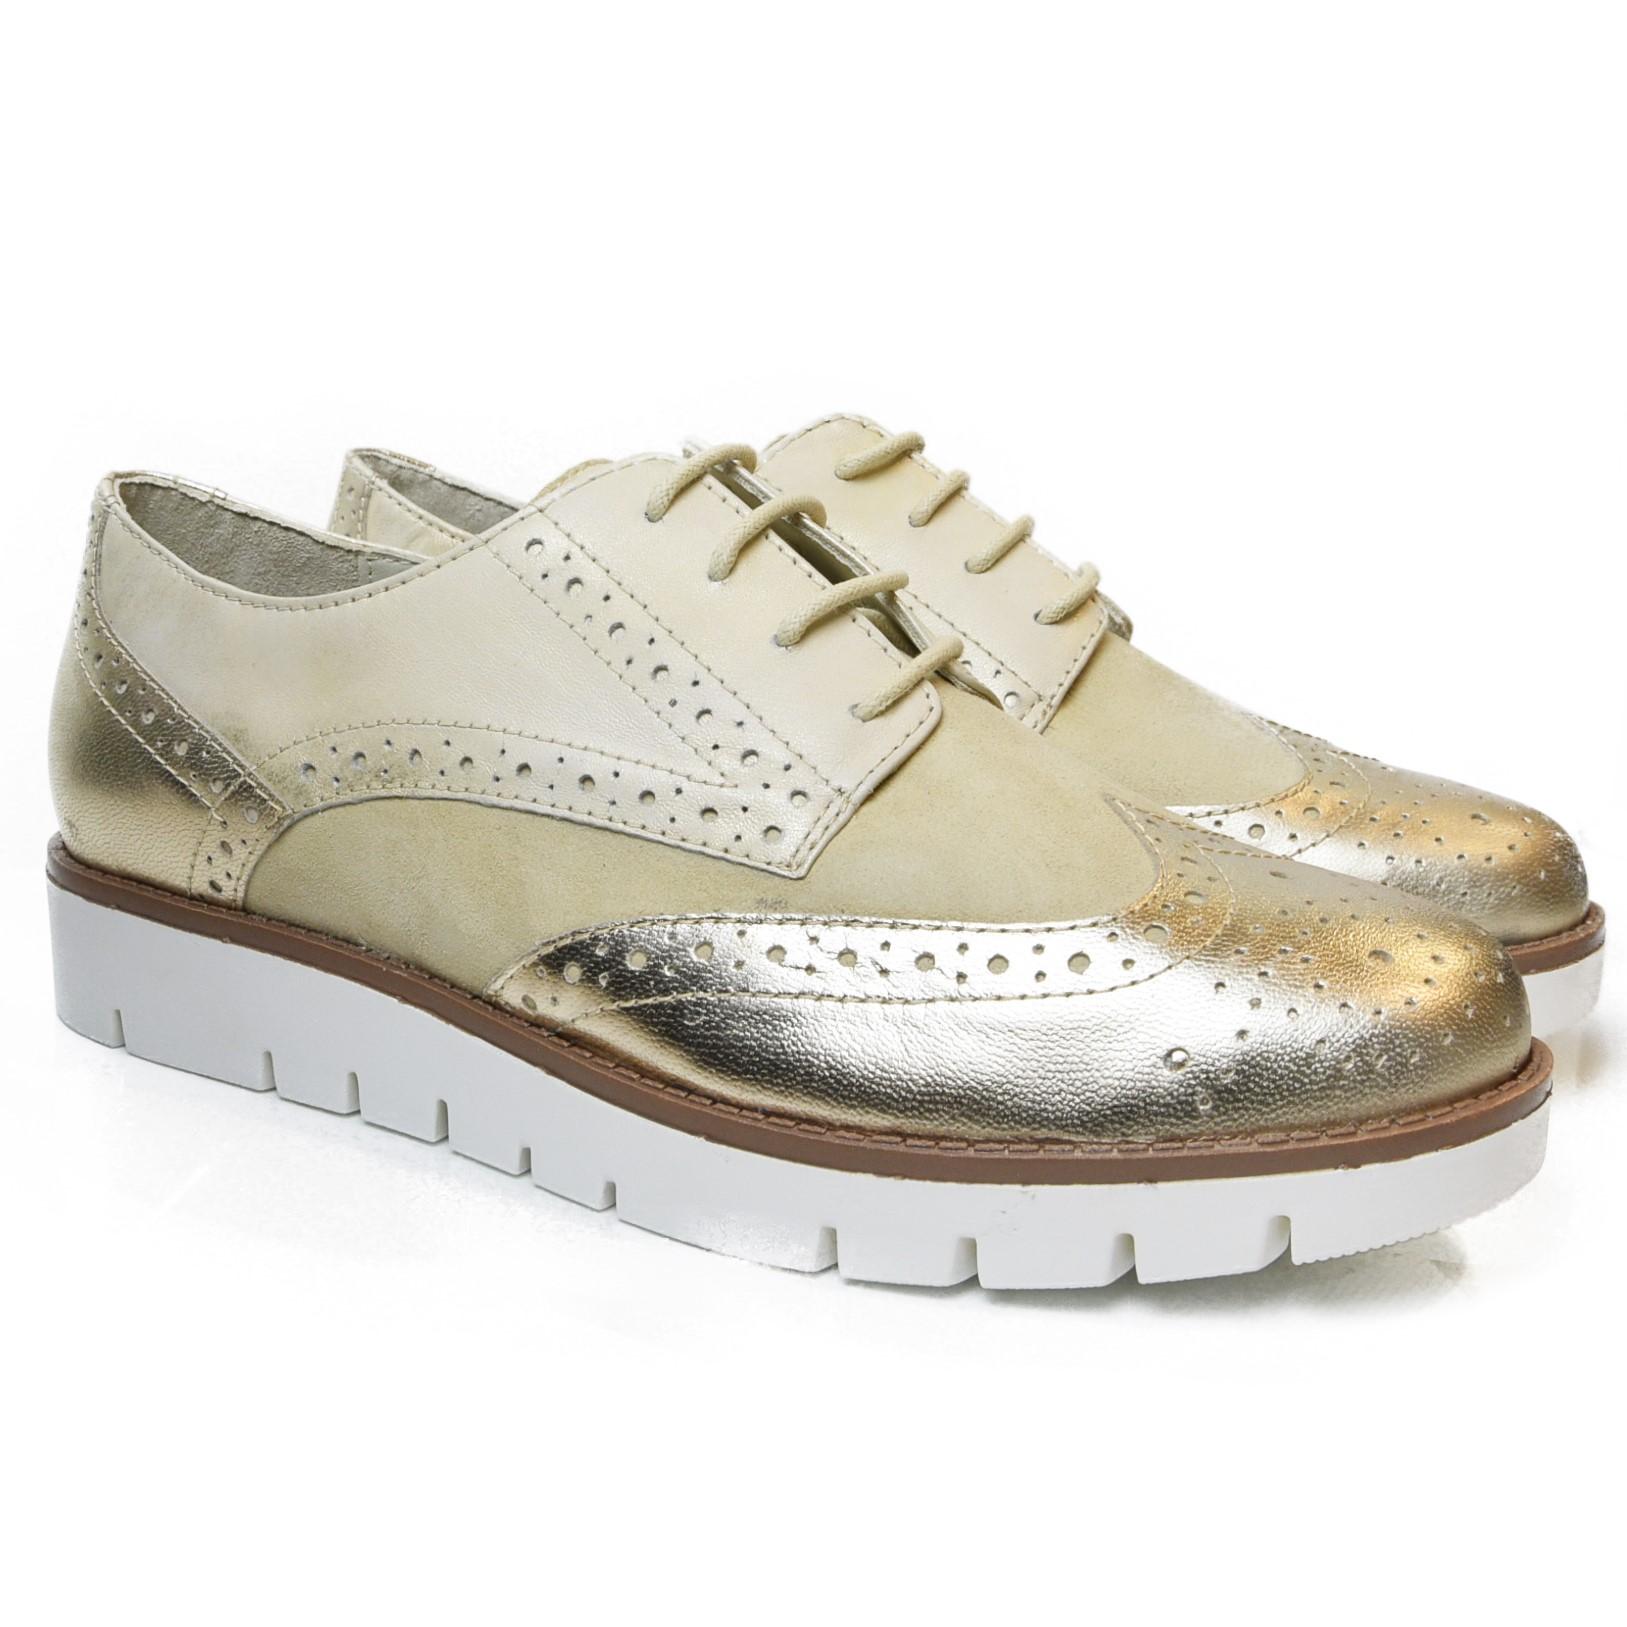 DR. SCHOLL  zapatos SUMMER  mujer VIRGINIA CON LACCI SUMMER zapatos PLATINO b841ad